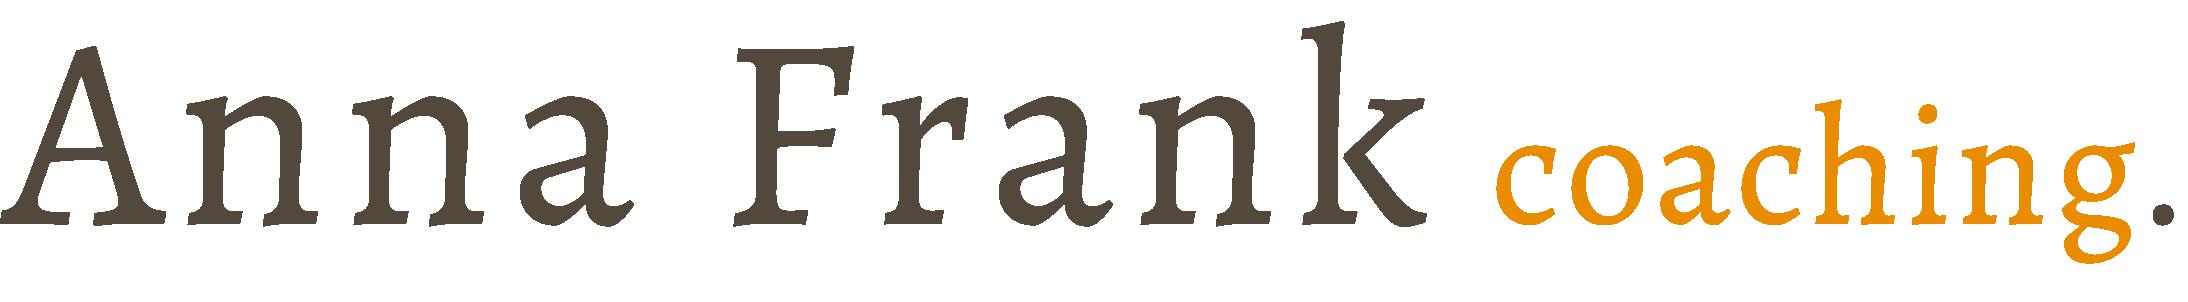 Anna Frank Coaching